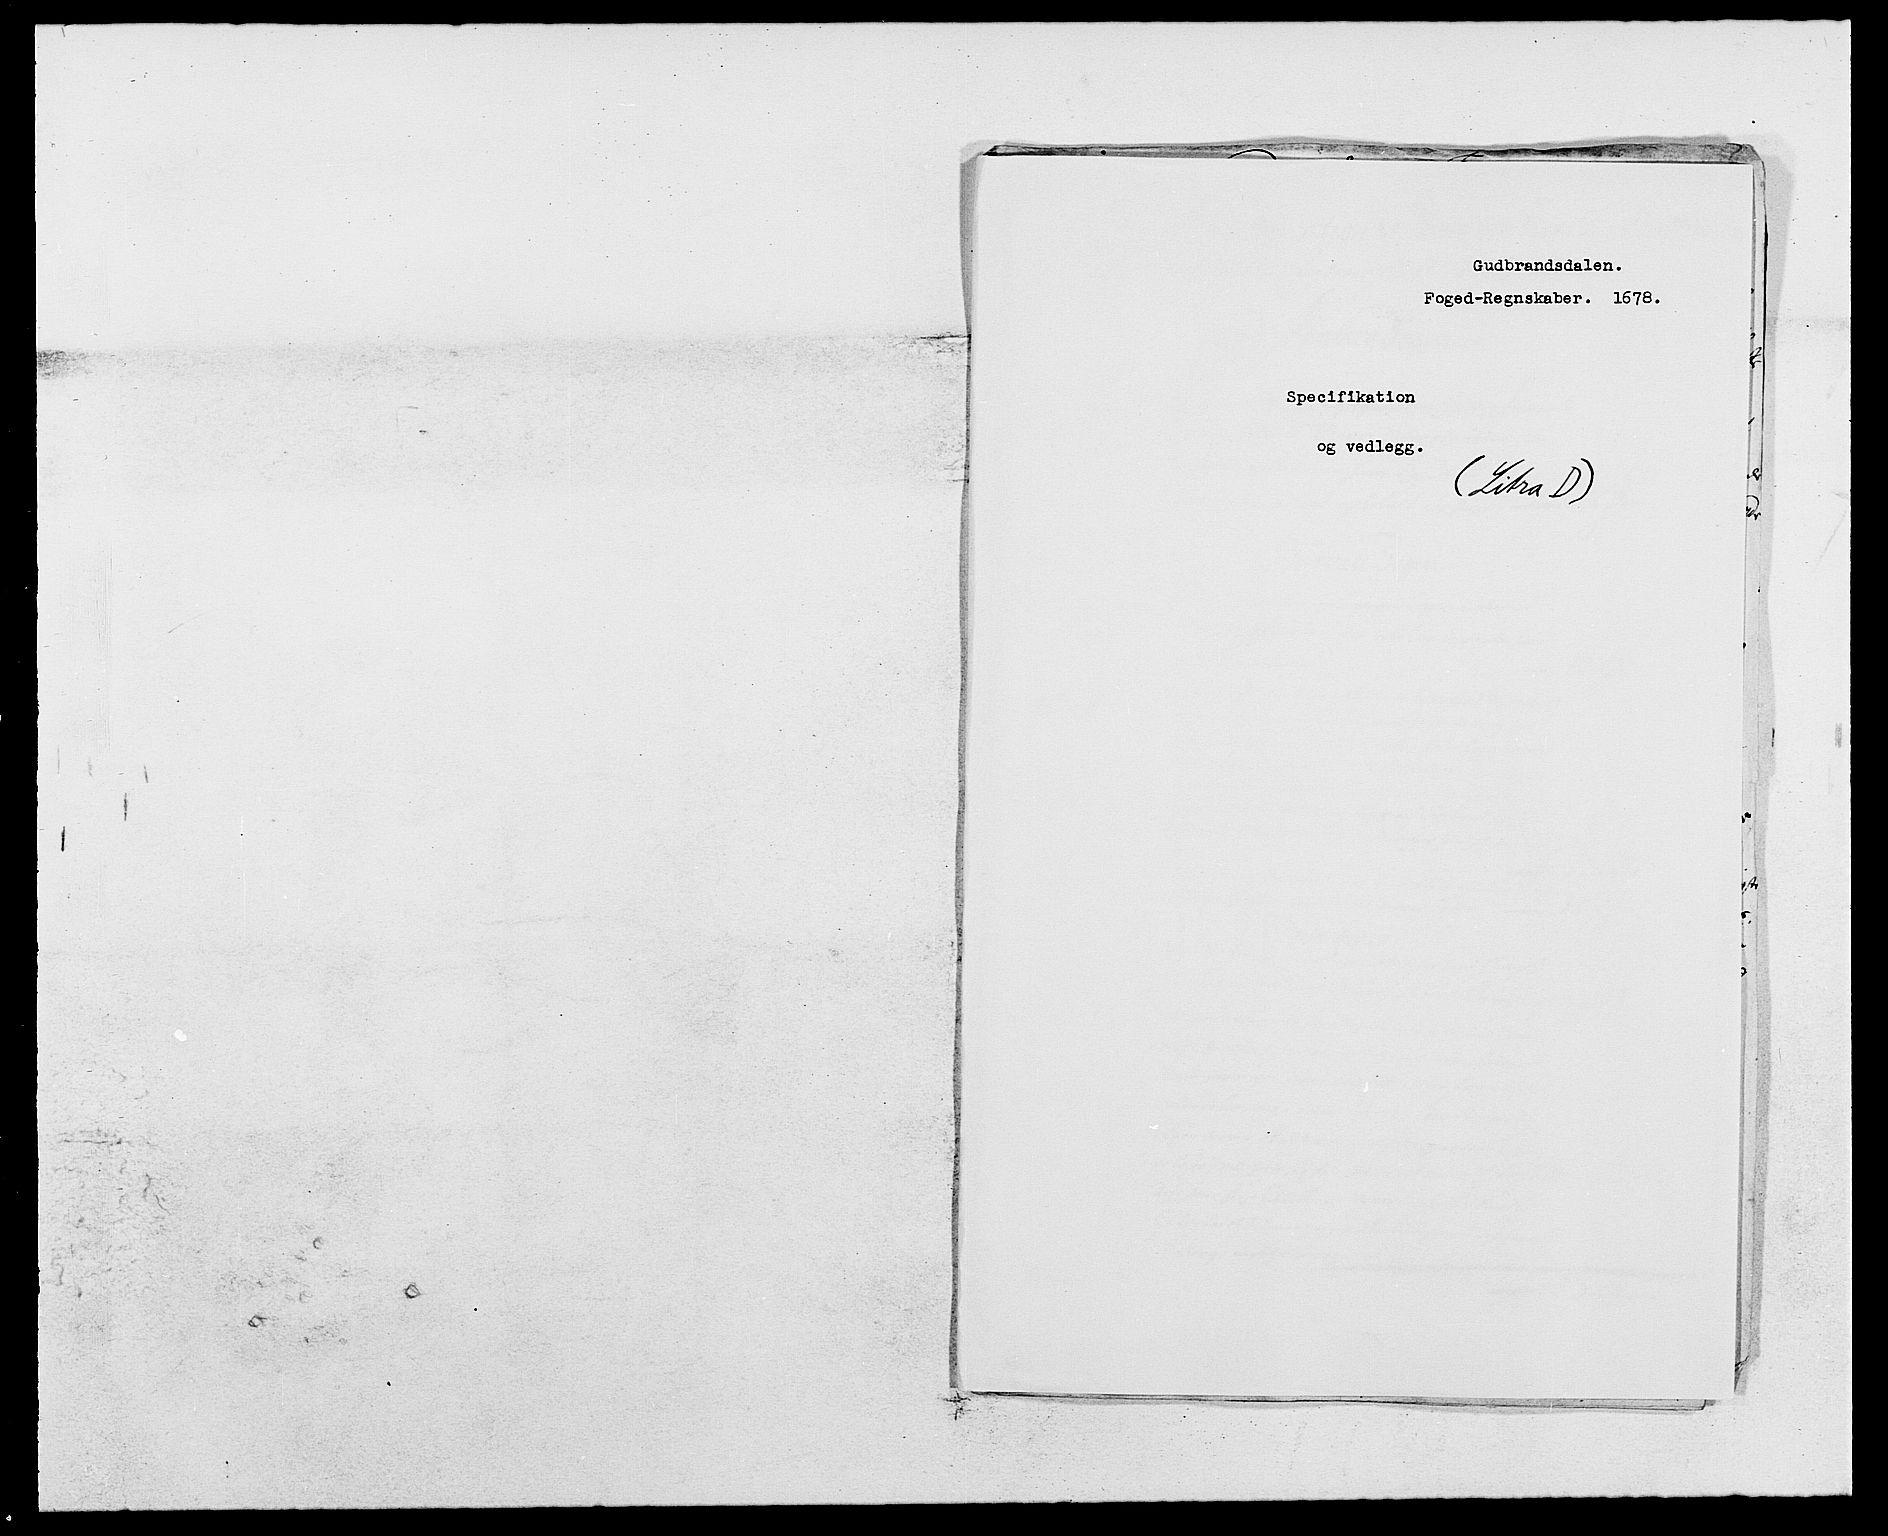 RA, Rentekammeret inntil 1814, Reviderte regnskaper, Fogderegnskap, R17/L1152: Fogderegnskap Gudbrandsdal, 1678-1679, s. 204